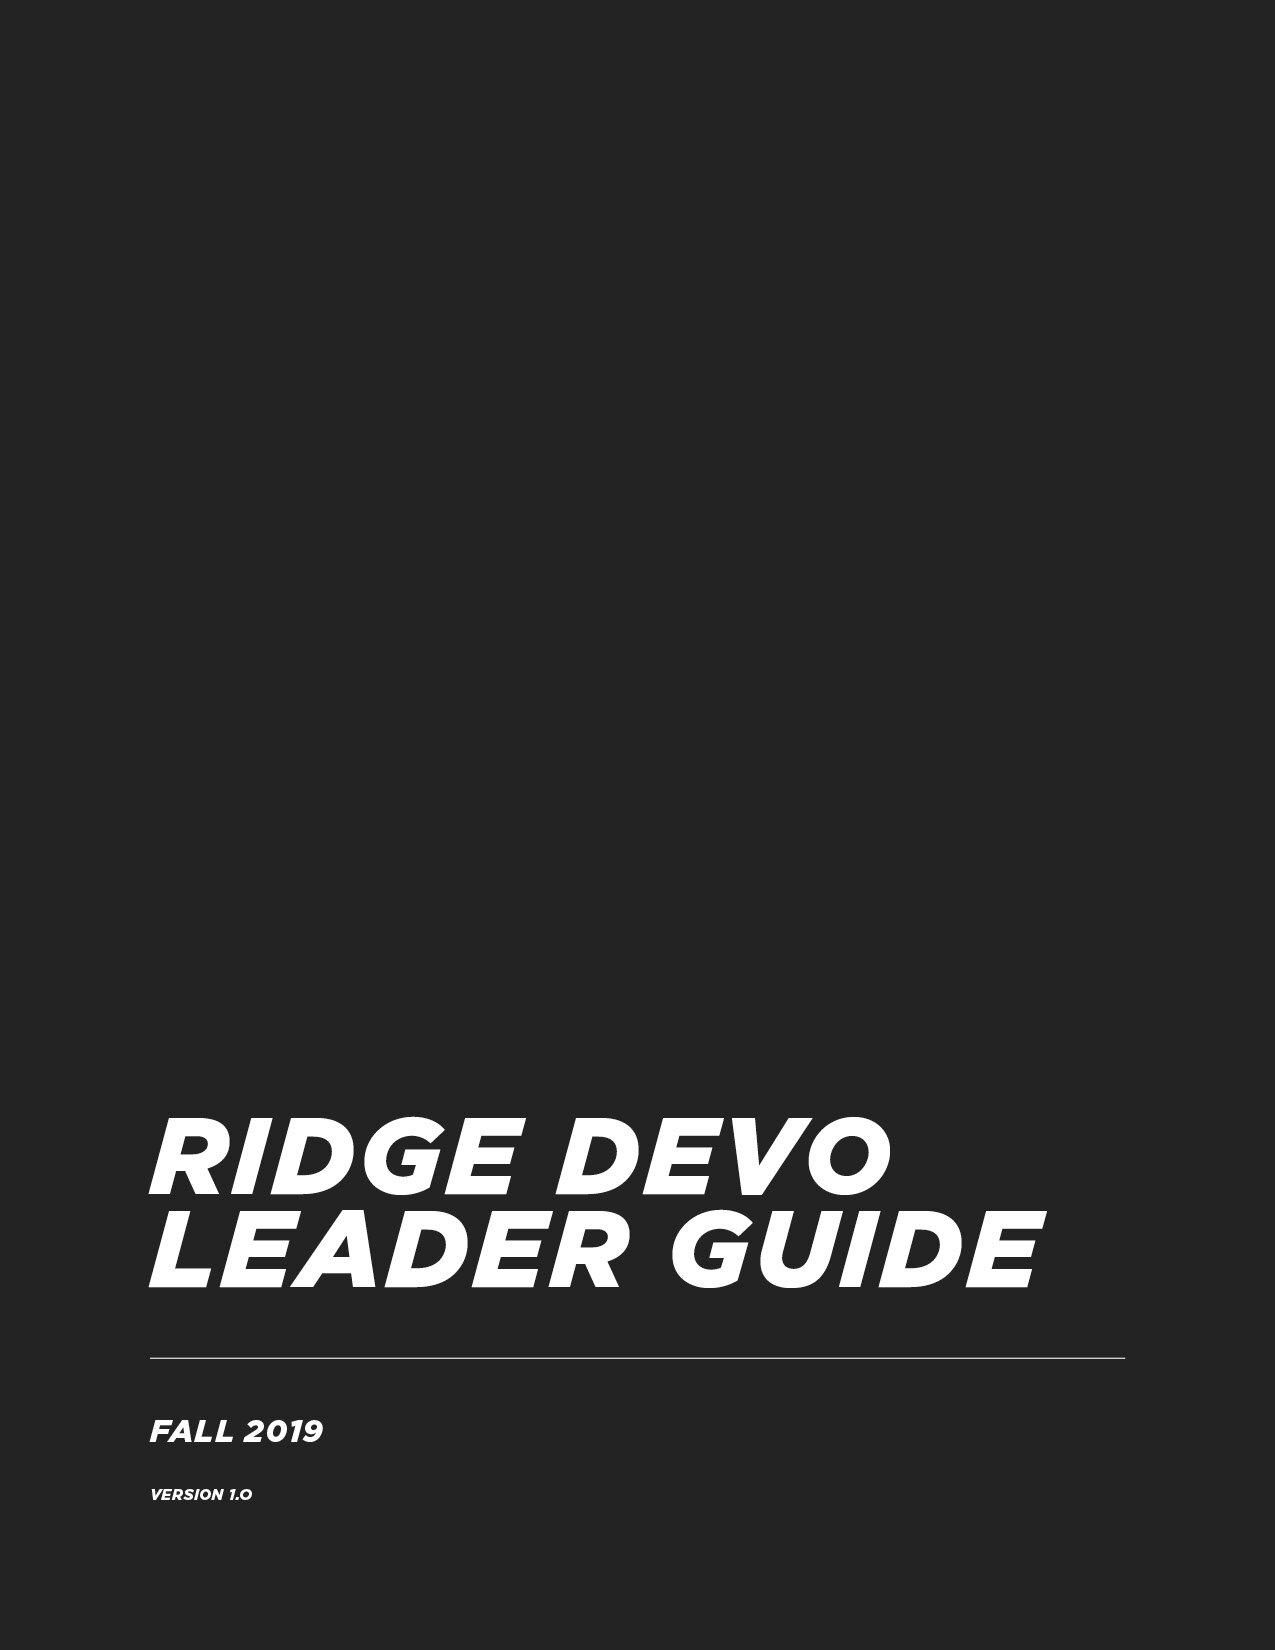 Leader Devo Guide - Version 1.0